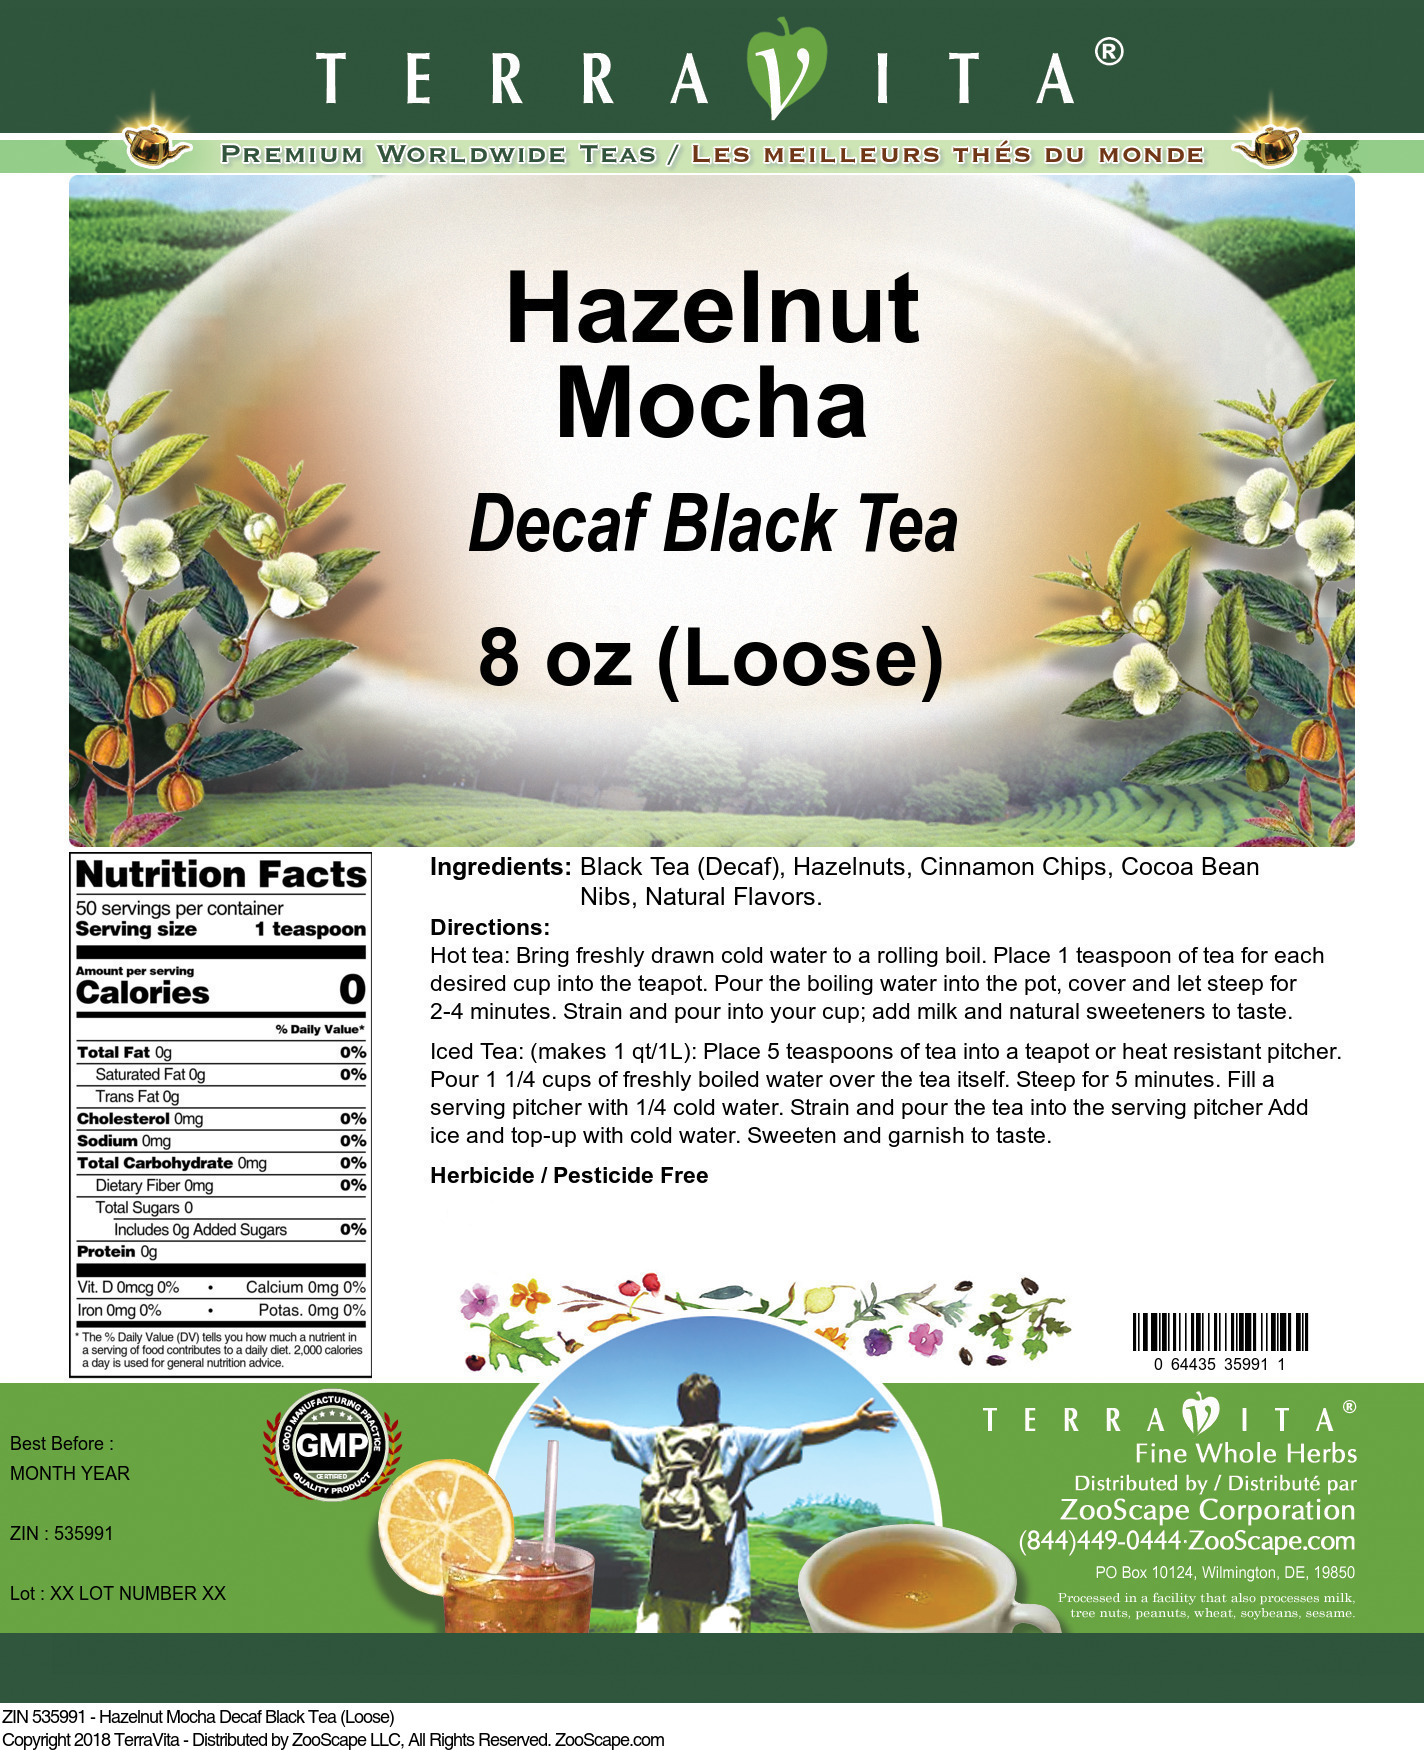 Hazelnut Mocha Decaf Black Tea